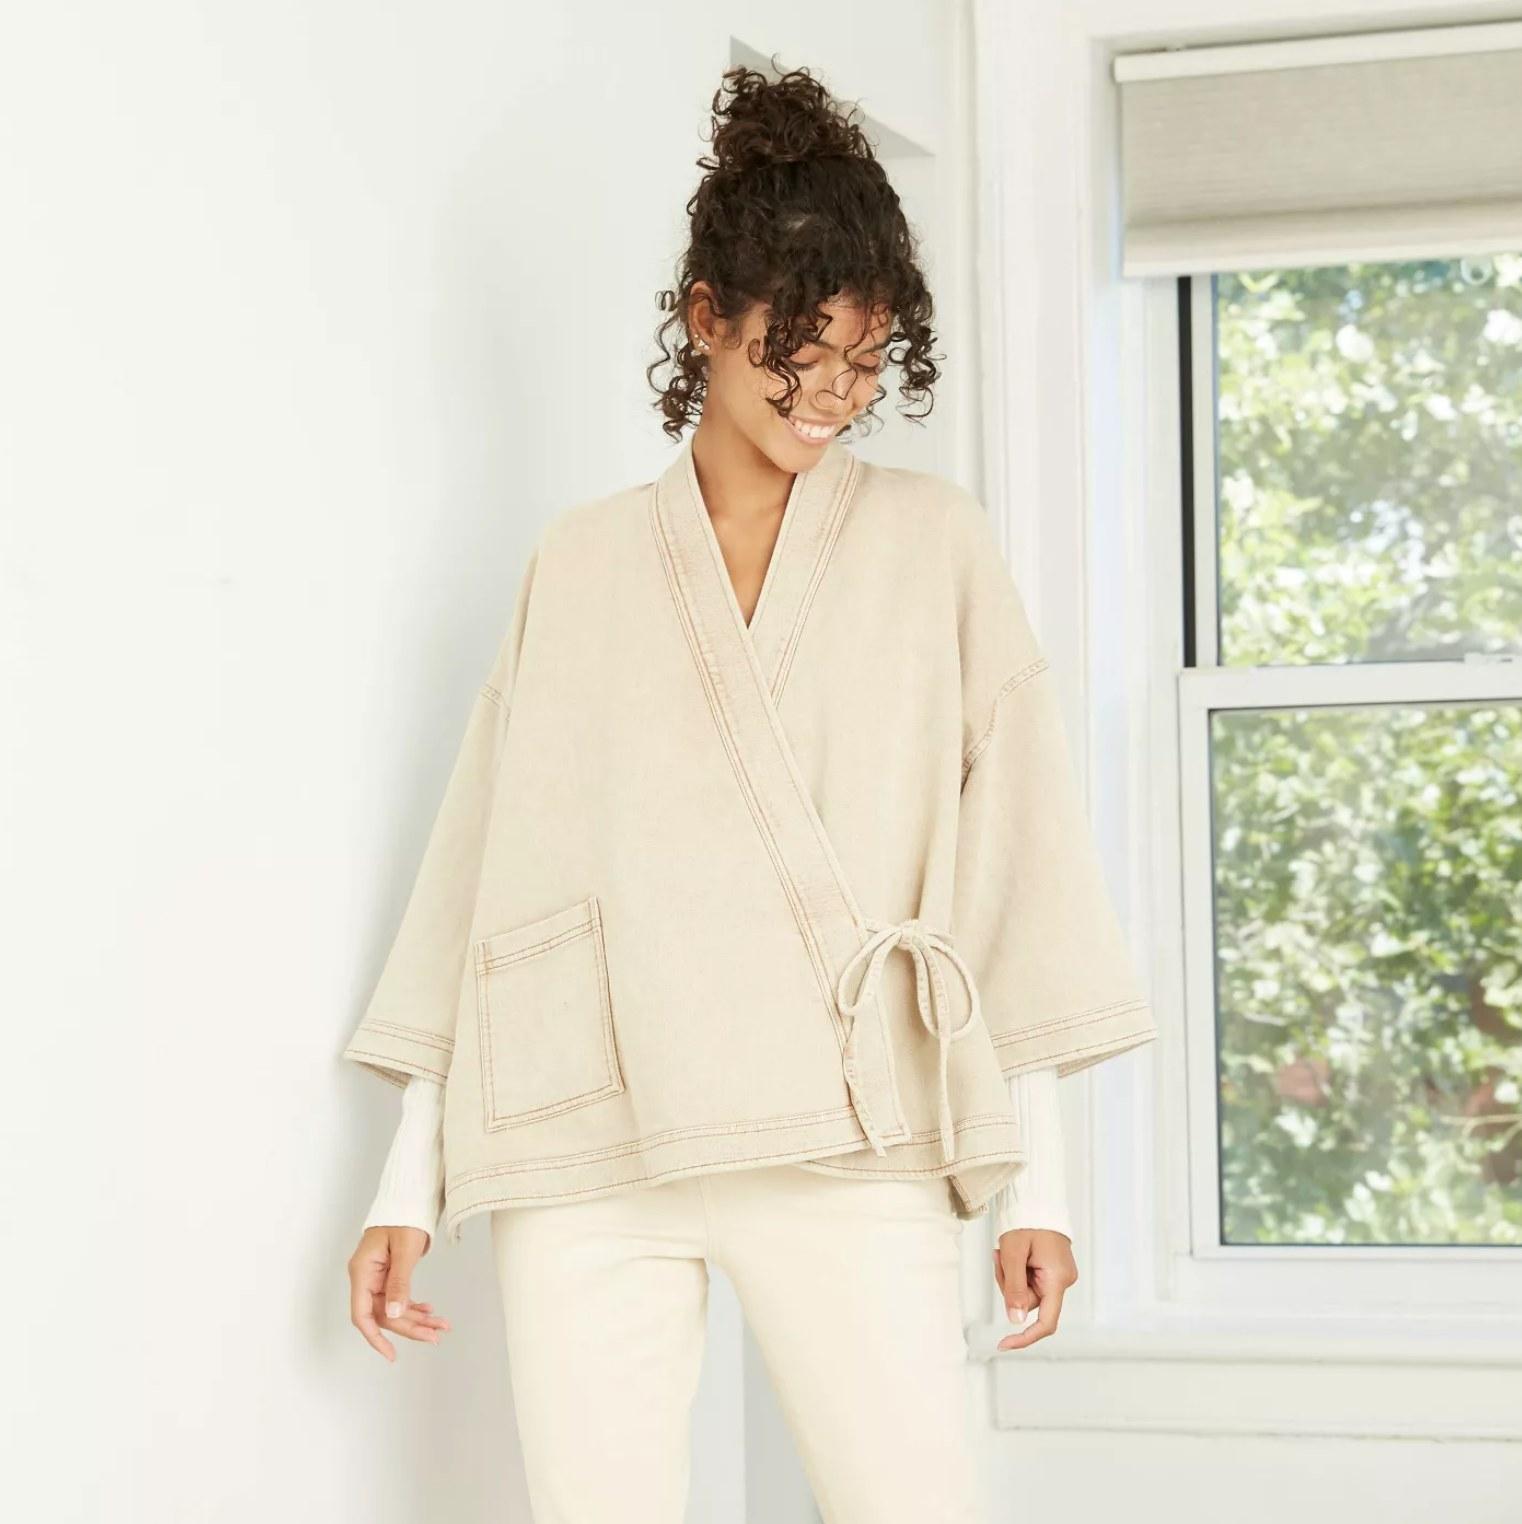 Model wearing the cream coat